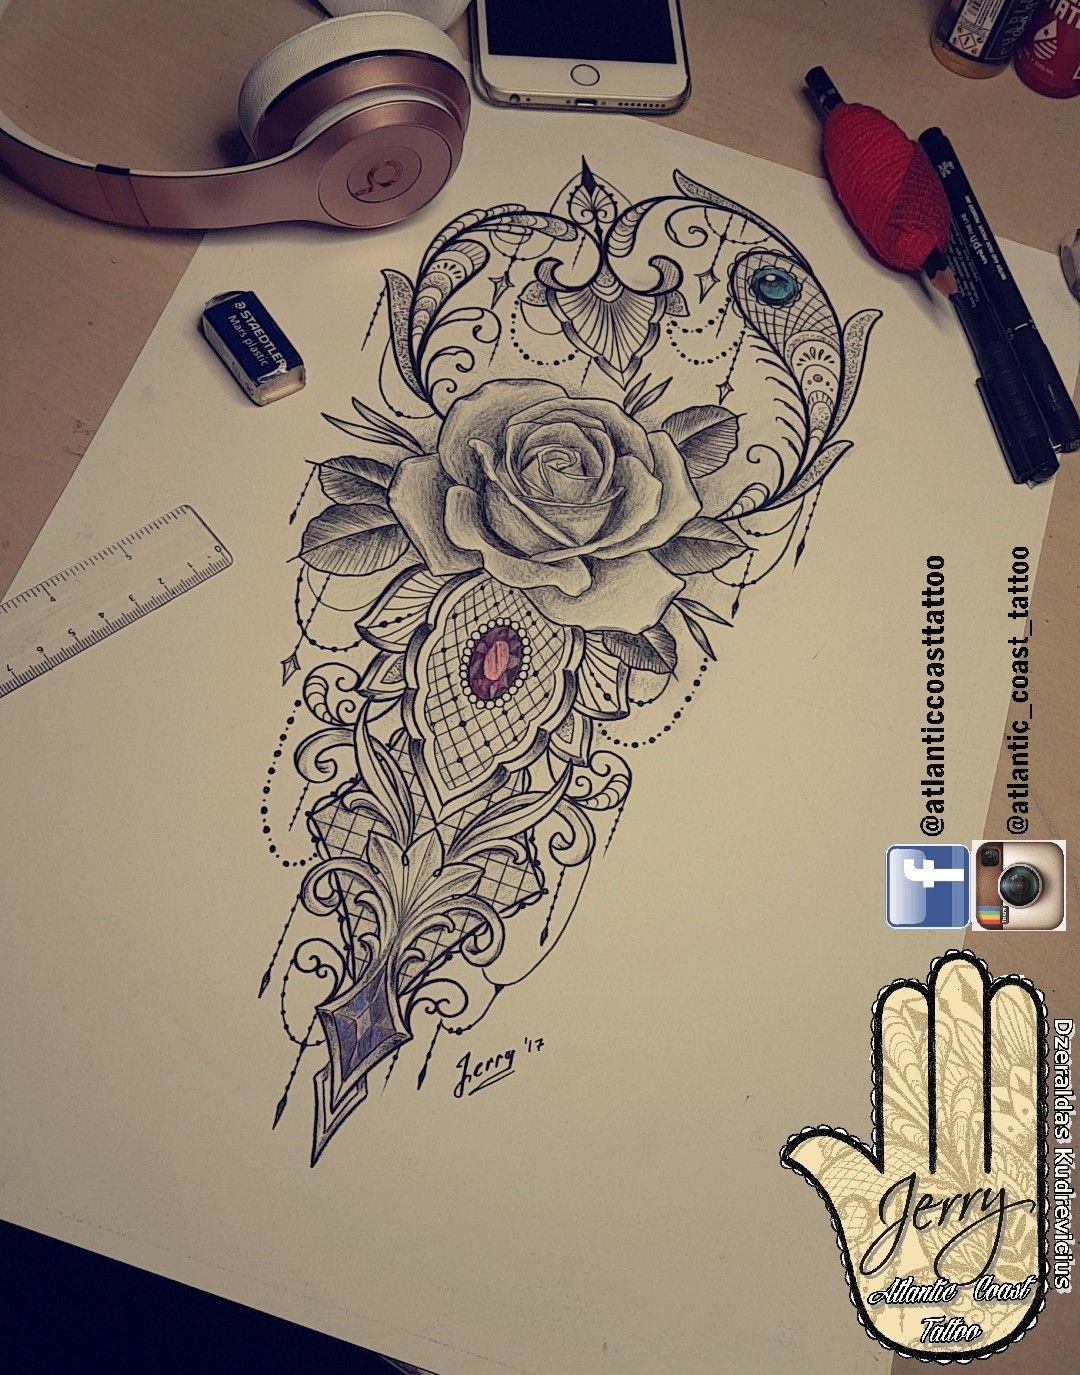 Beautiful Rose Tattoo Idea Design For A Thigh Arm By Dzeraldas Jerry Kudrevicius From Atlantic Coast Tattoo Mandala Lotus Leg Tattoos Cuff Tattoo Hip Tattoo